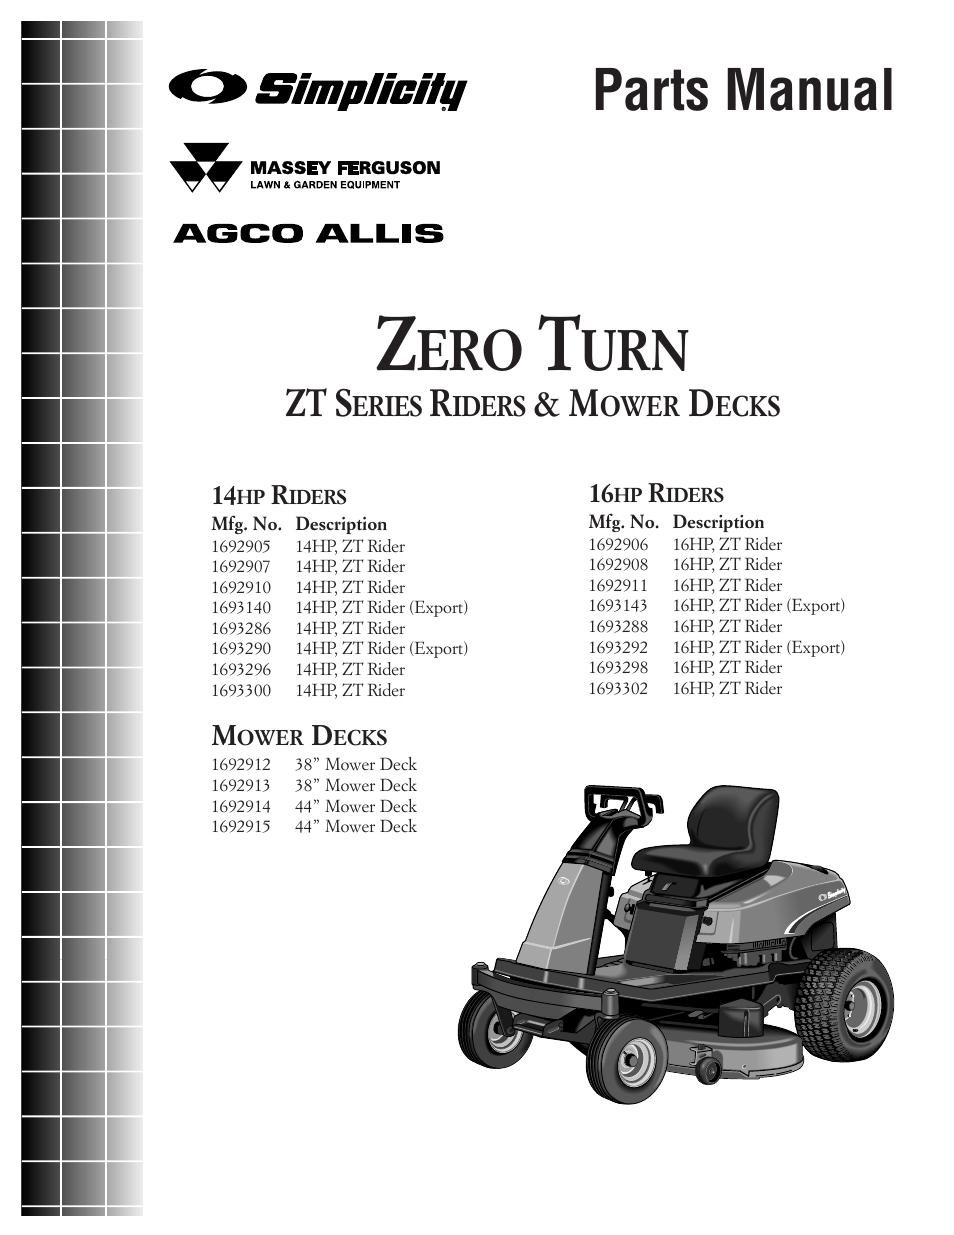 simplicity zero turn tp 400 2169 01 zt sma user manual 46 pages rh manualsdir com simplicity champion zero turn mower manual simplicity zero turn mower deck parts